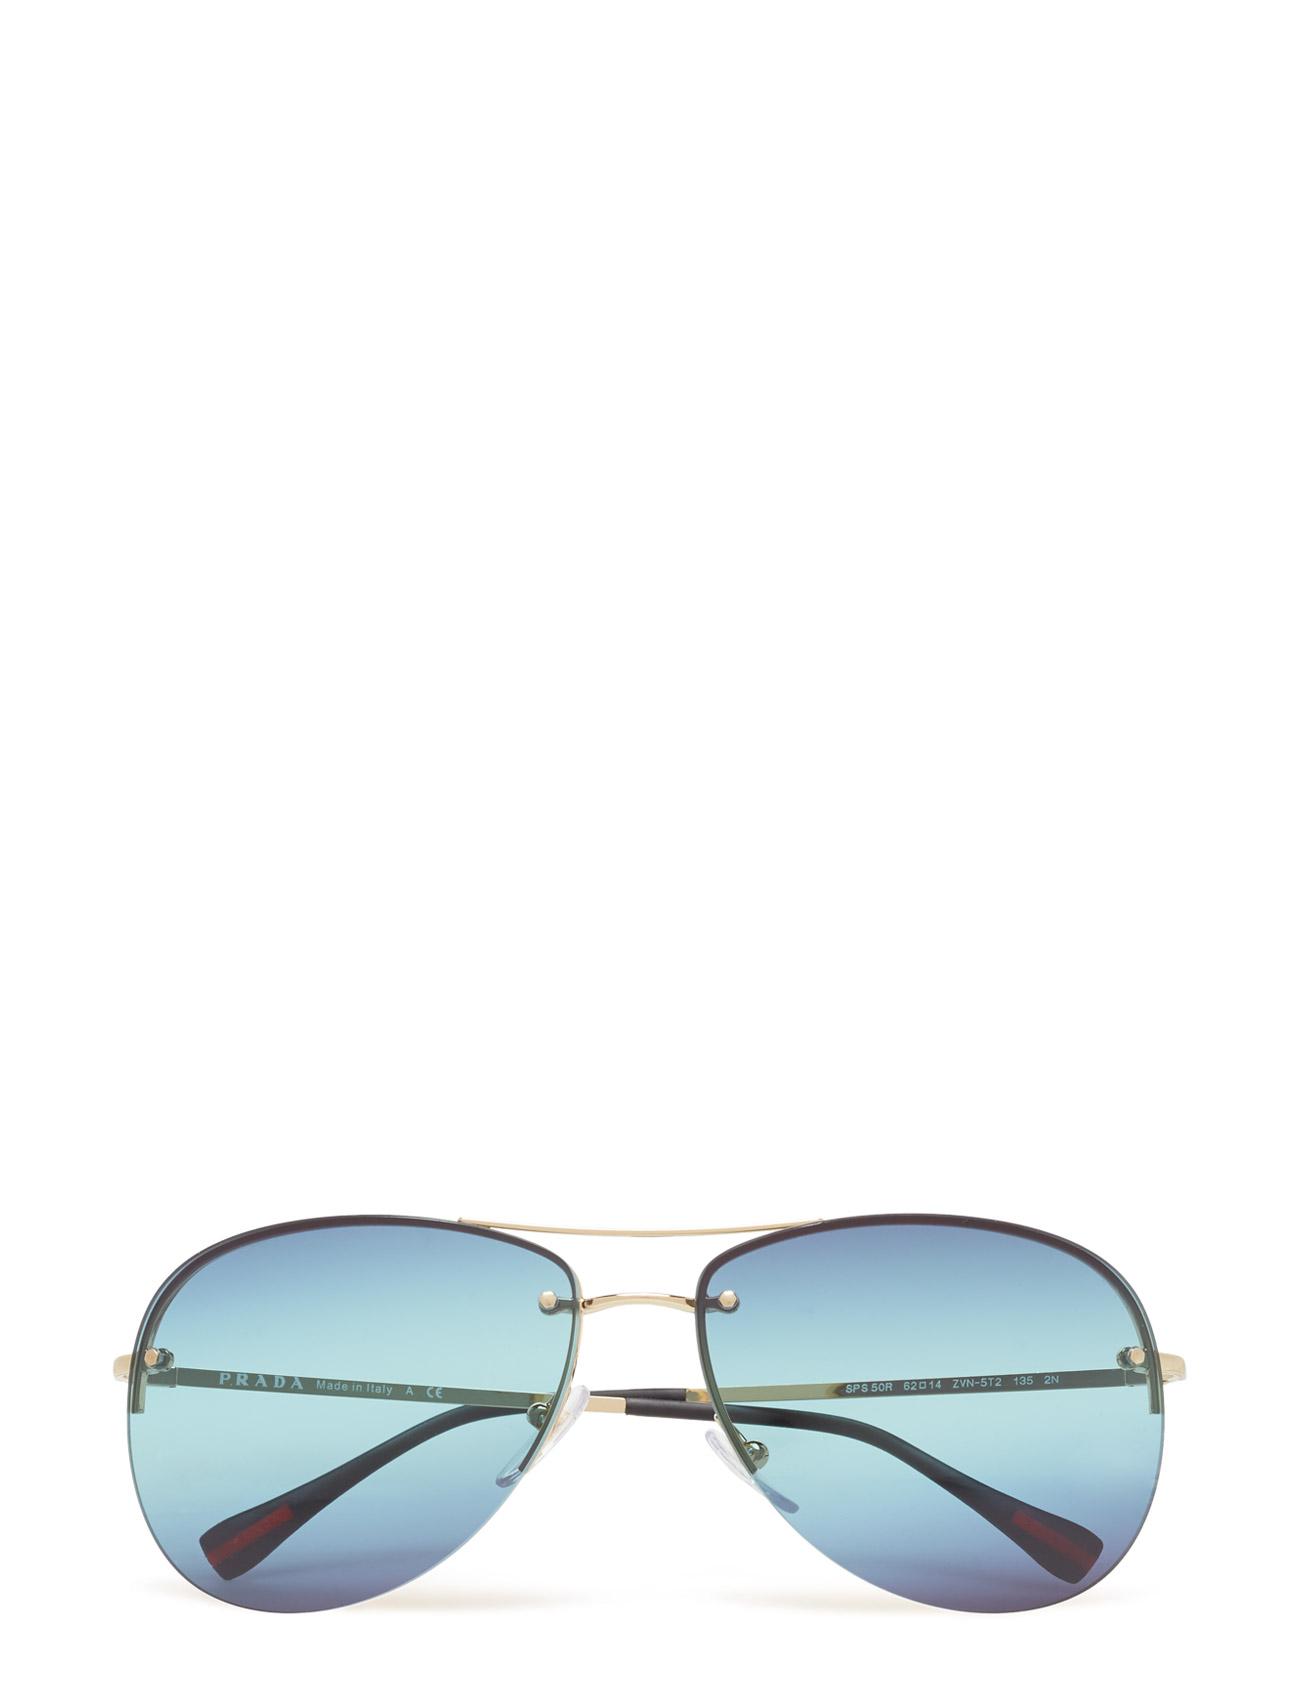 Lifestyle Prada Sport Sunglasses Solbriller til Herrer i